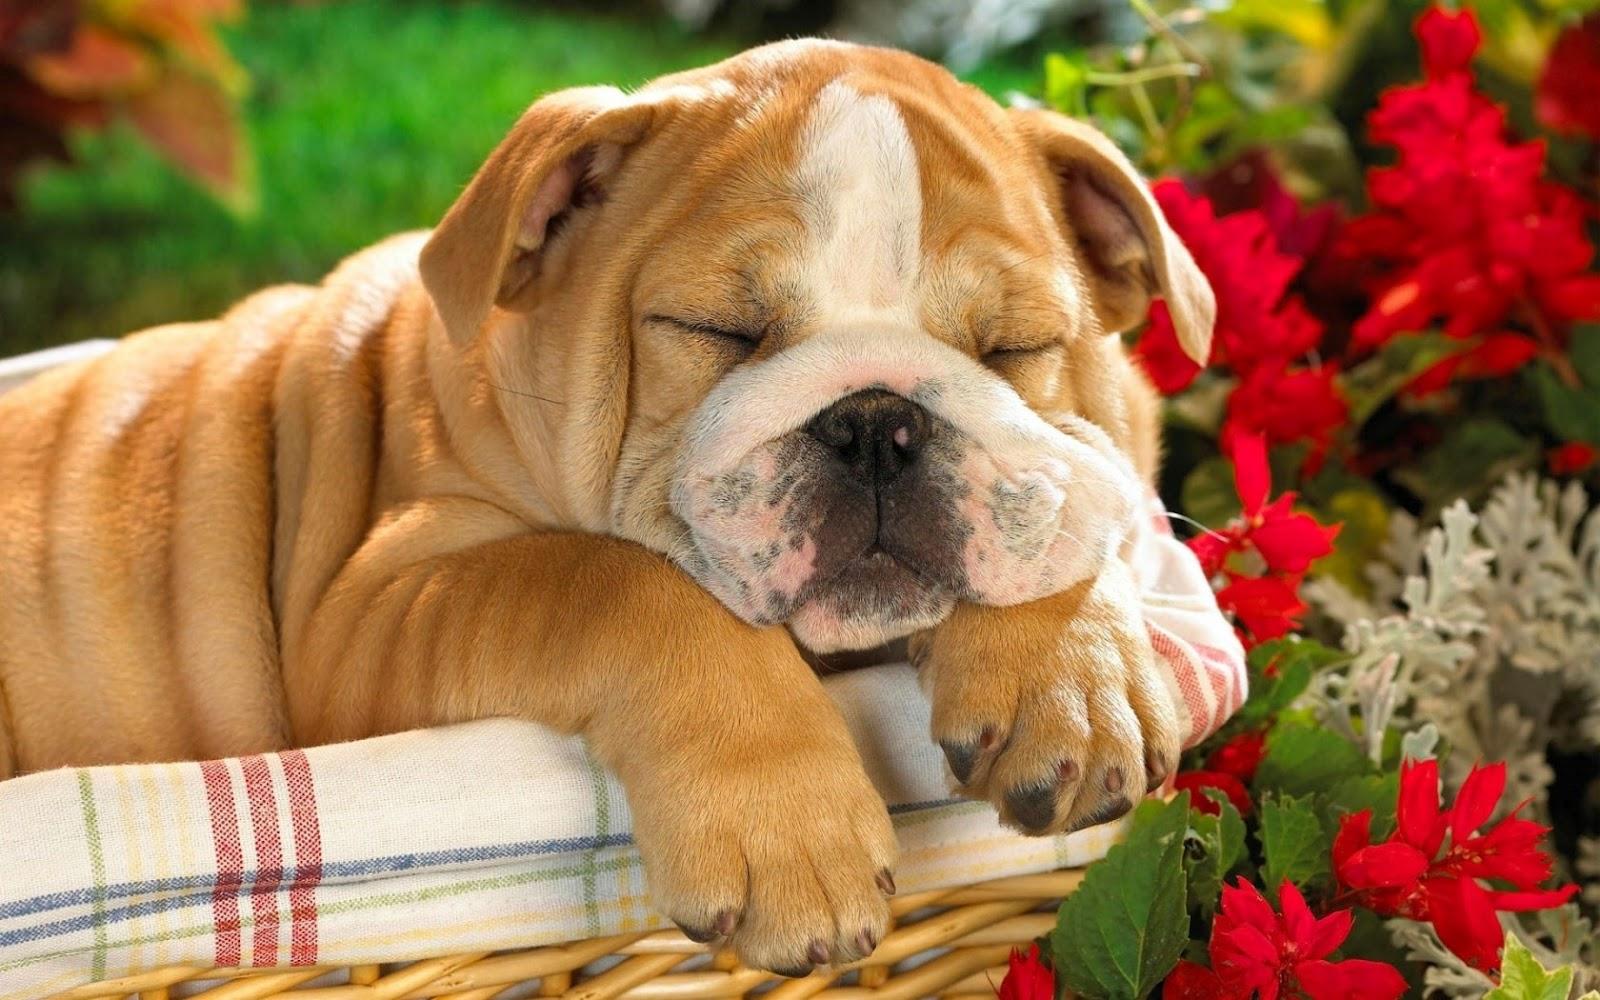 http://1.bp.blogspot.com/-oHOBw7yTU0E/T5_zd_fkmcI/AAAAAAAAB2U/m1-yvGPkRKY/s1600/lazy_dog-1680x1050.jpg